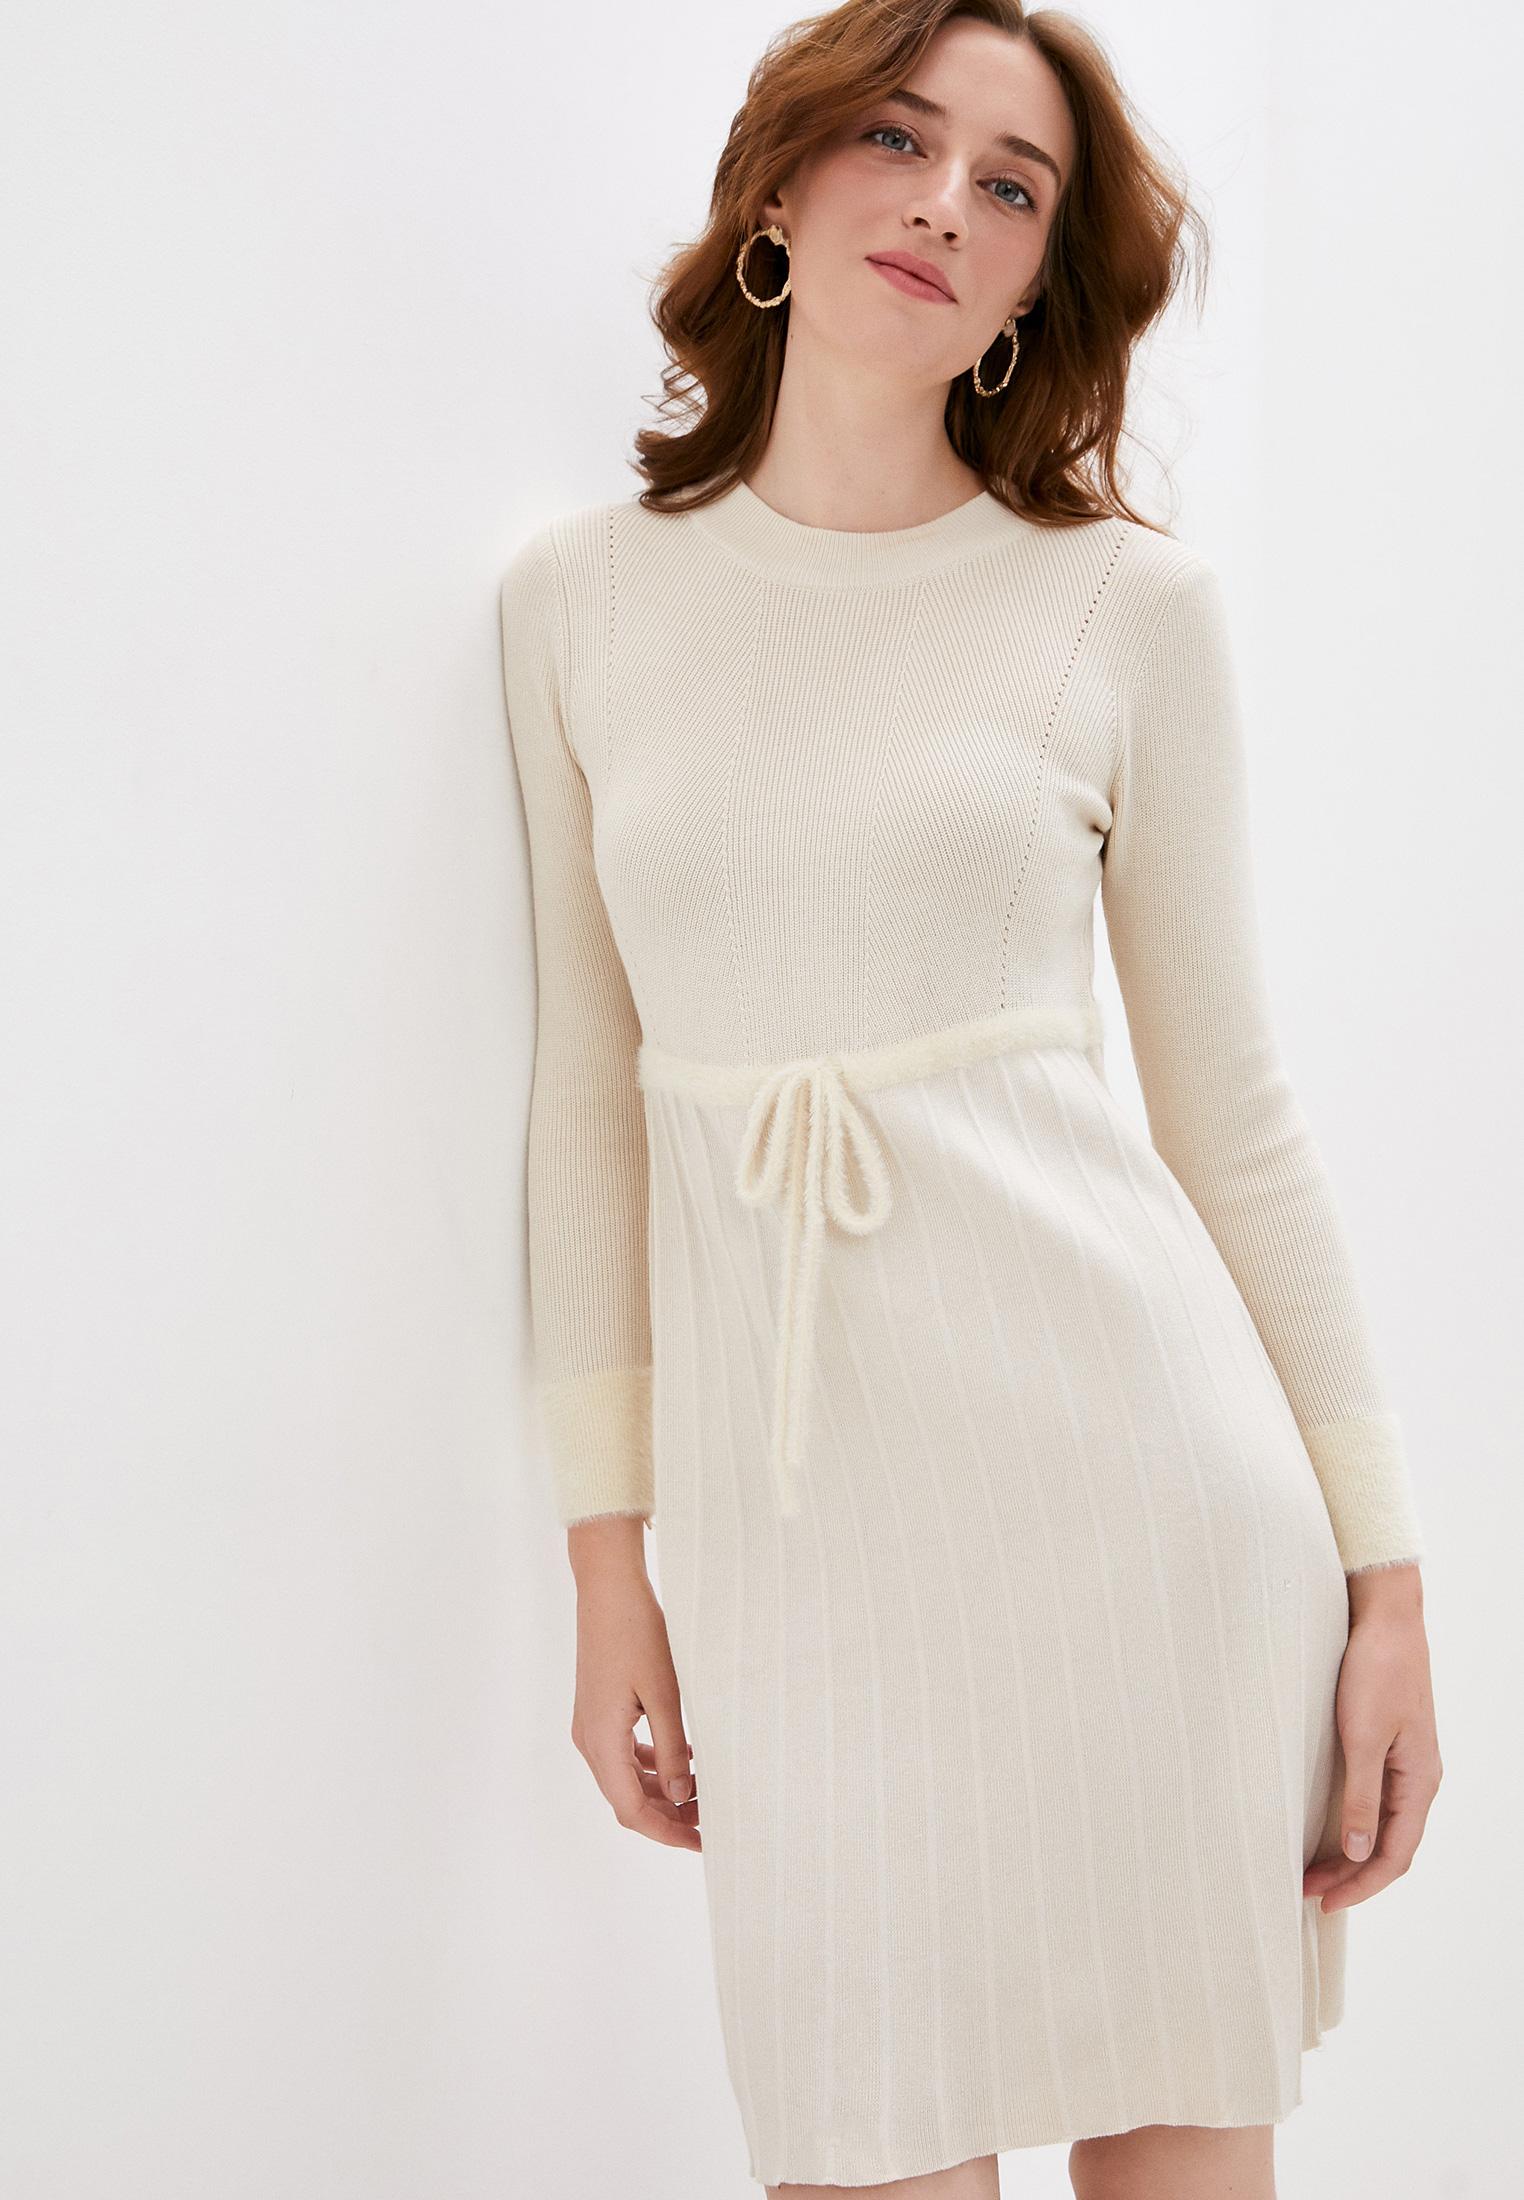 Вязаное платье Miss Gabby 8139